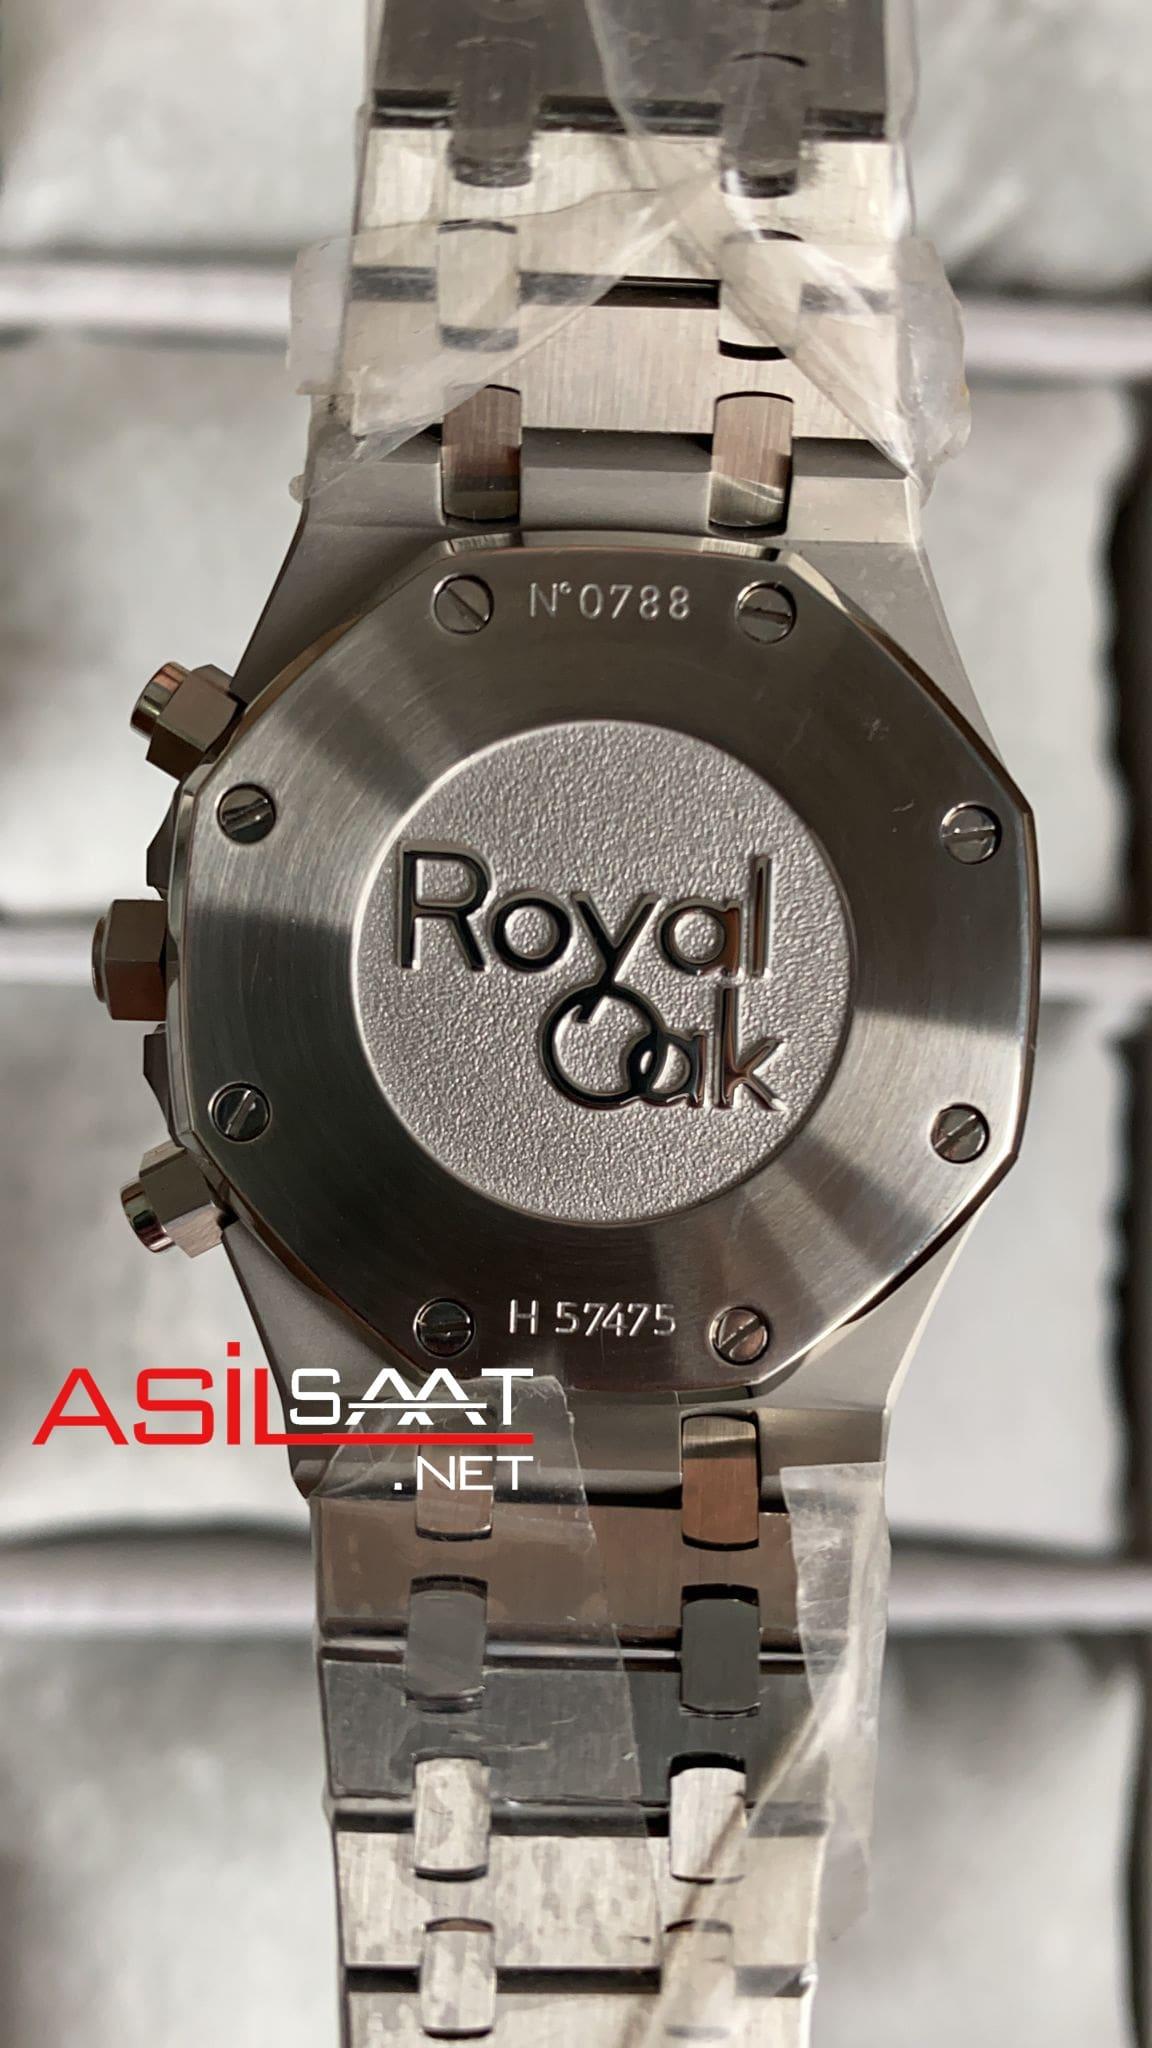 Audemars Piguet Royal Oak Replika Saat APR001